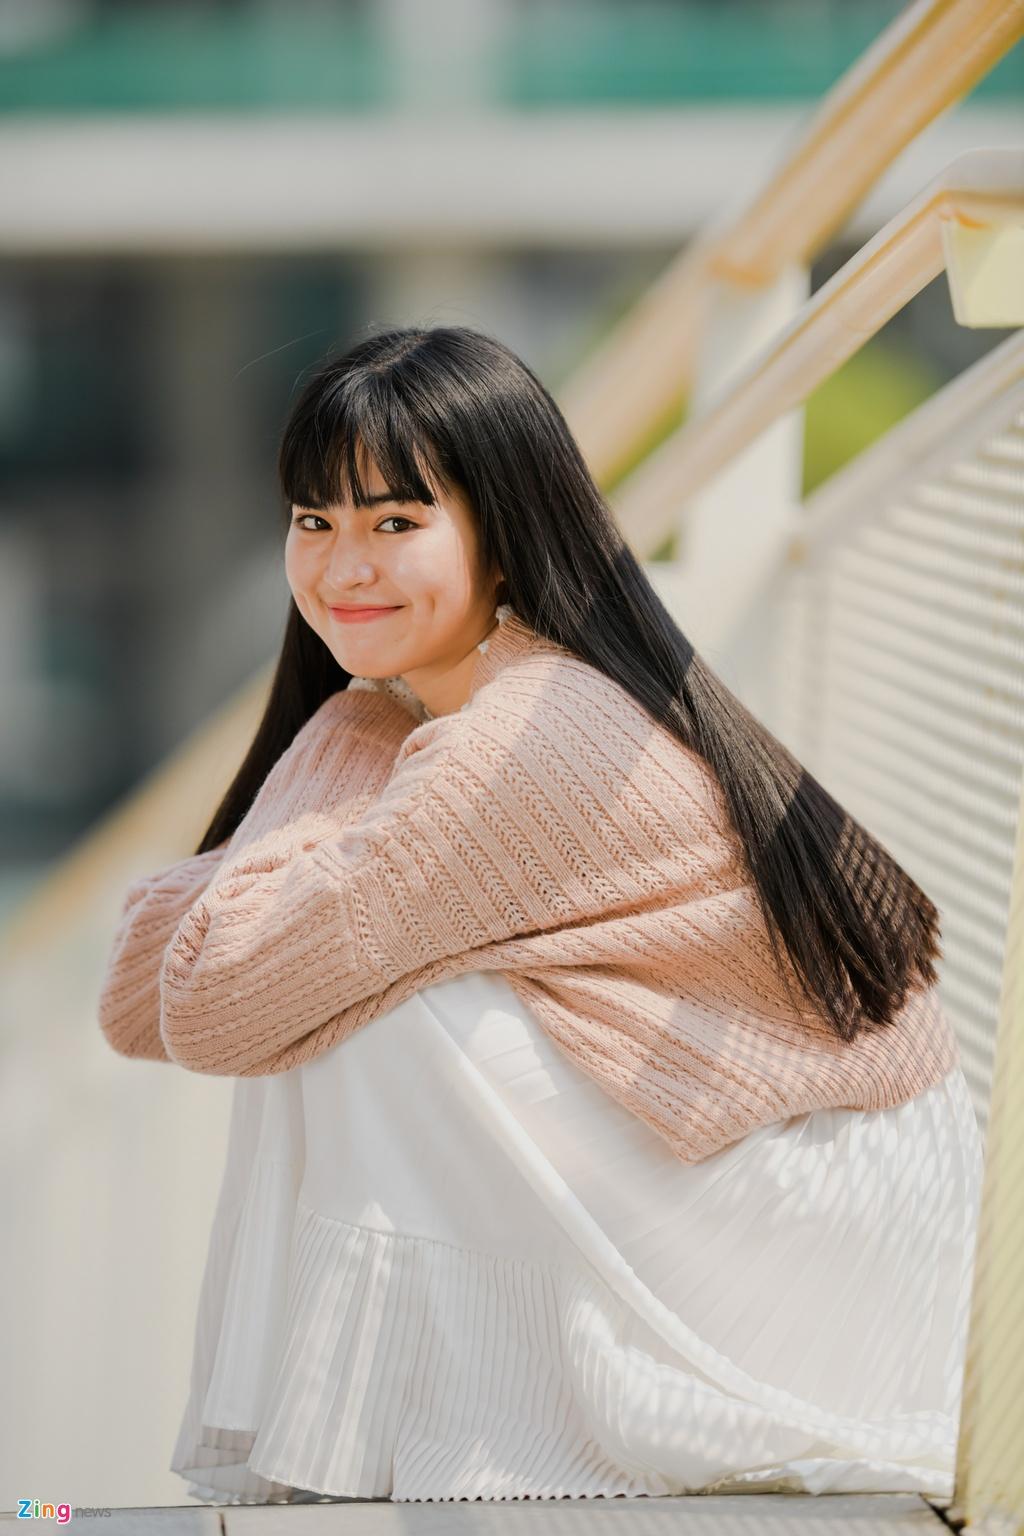 Nhan sac doi thuong cua Tra Long va Hong IELTS 8.5 hinh anh 7 matbiec6_zing.jpg